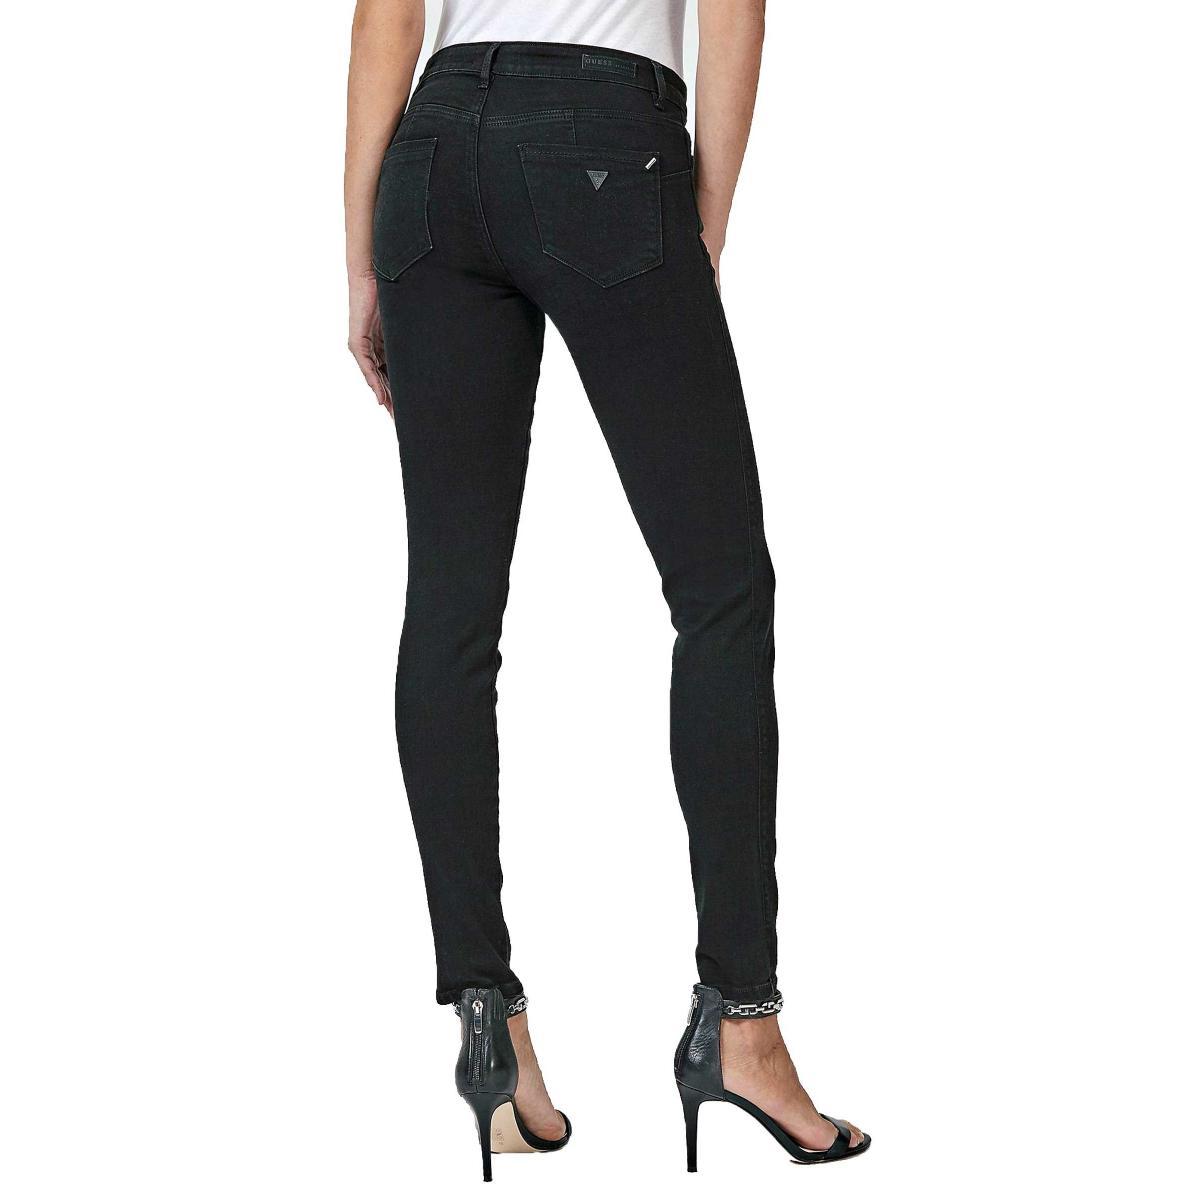 Jeans Guess skinny modello 5 tasche da donna rif. W83AJ2D38M0